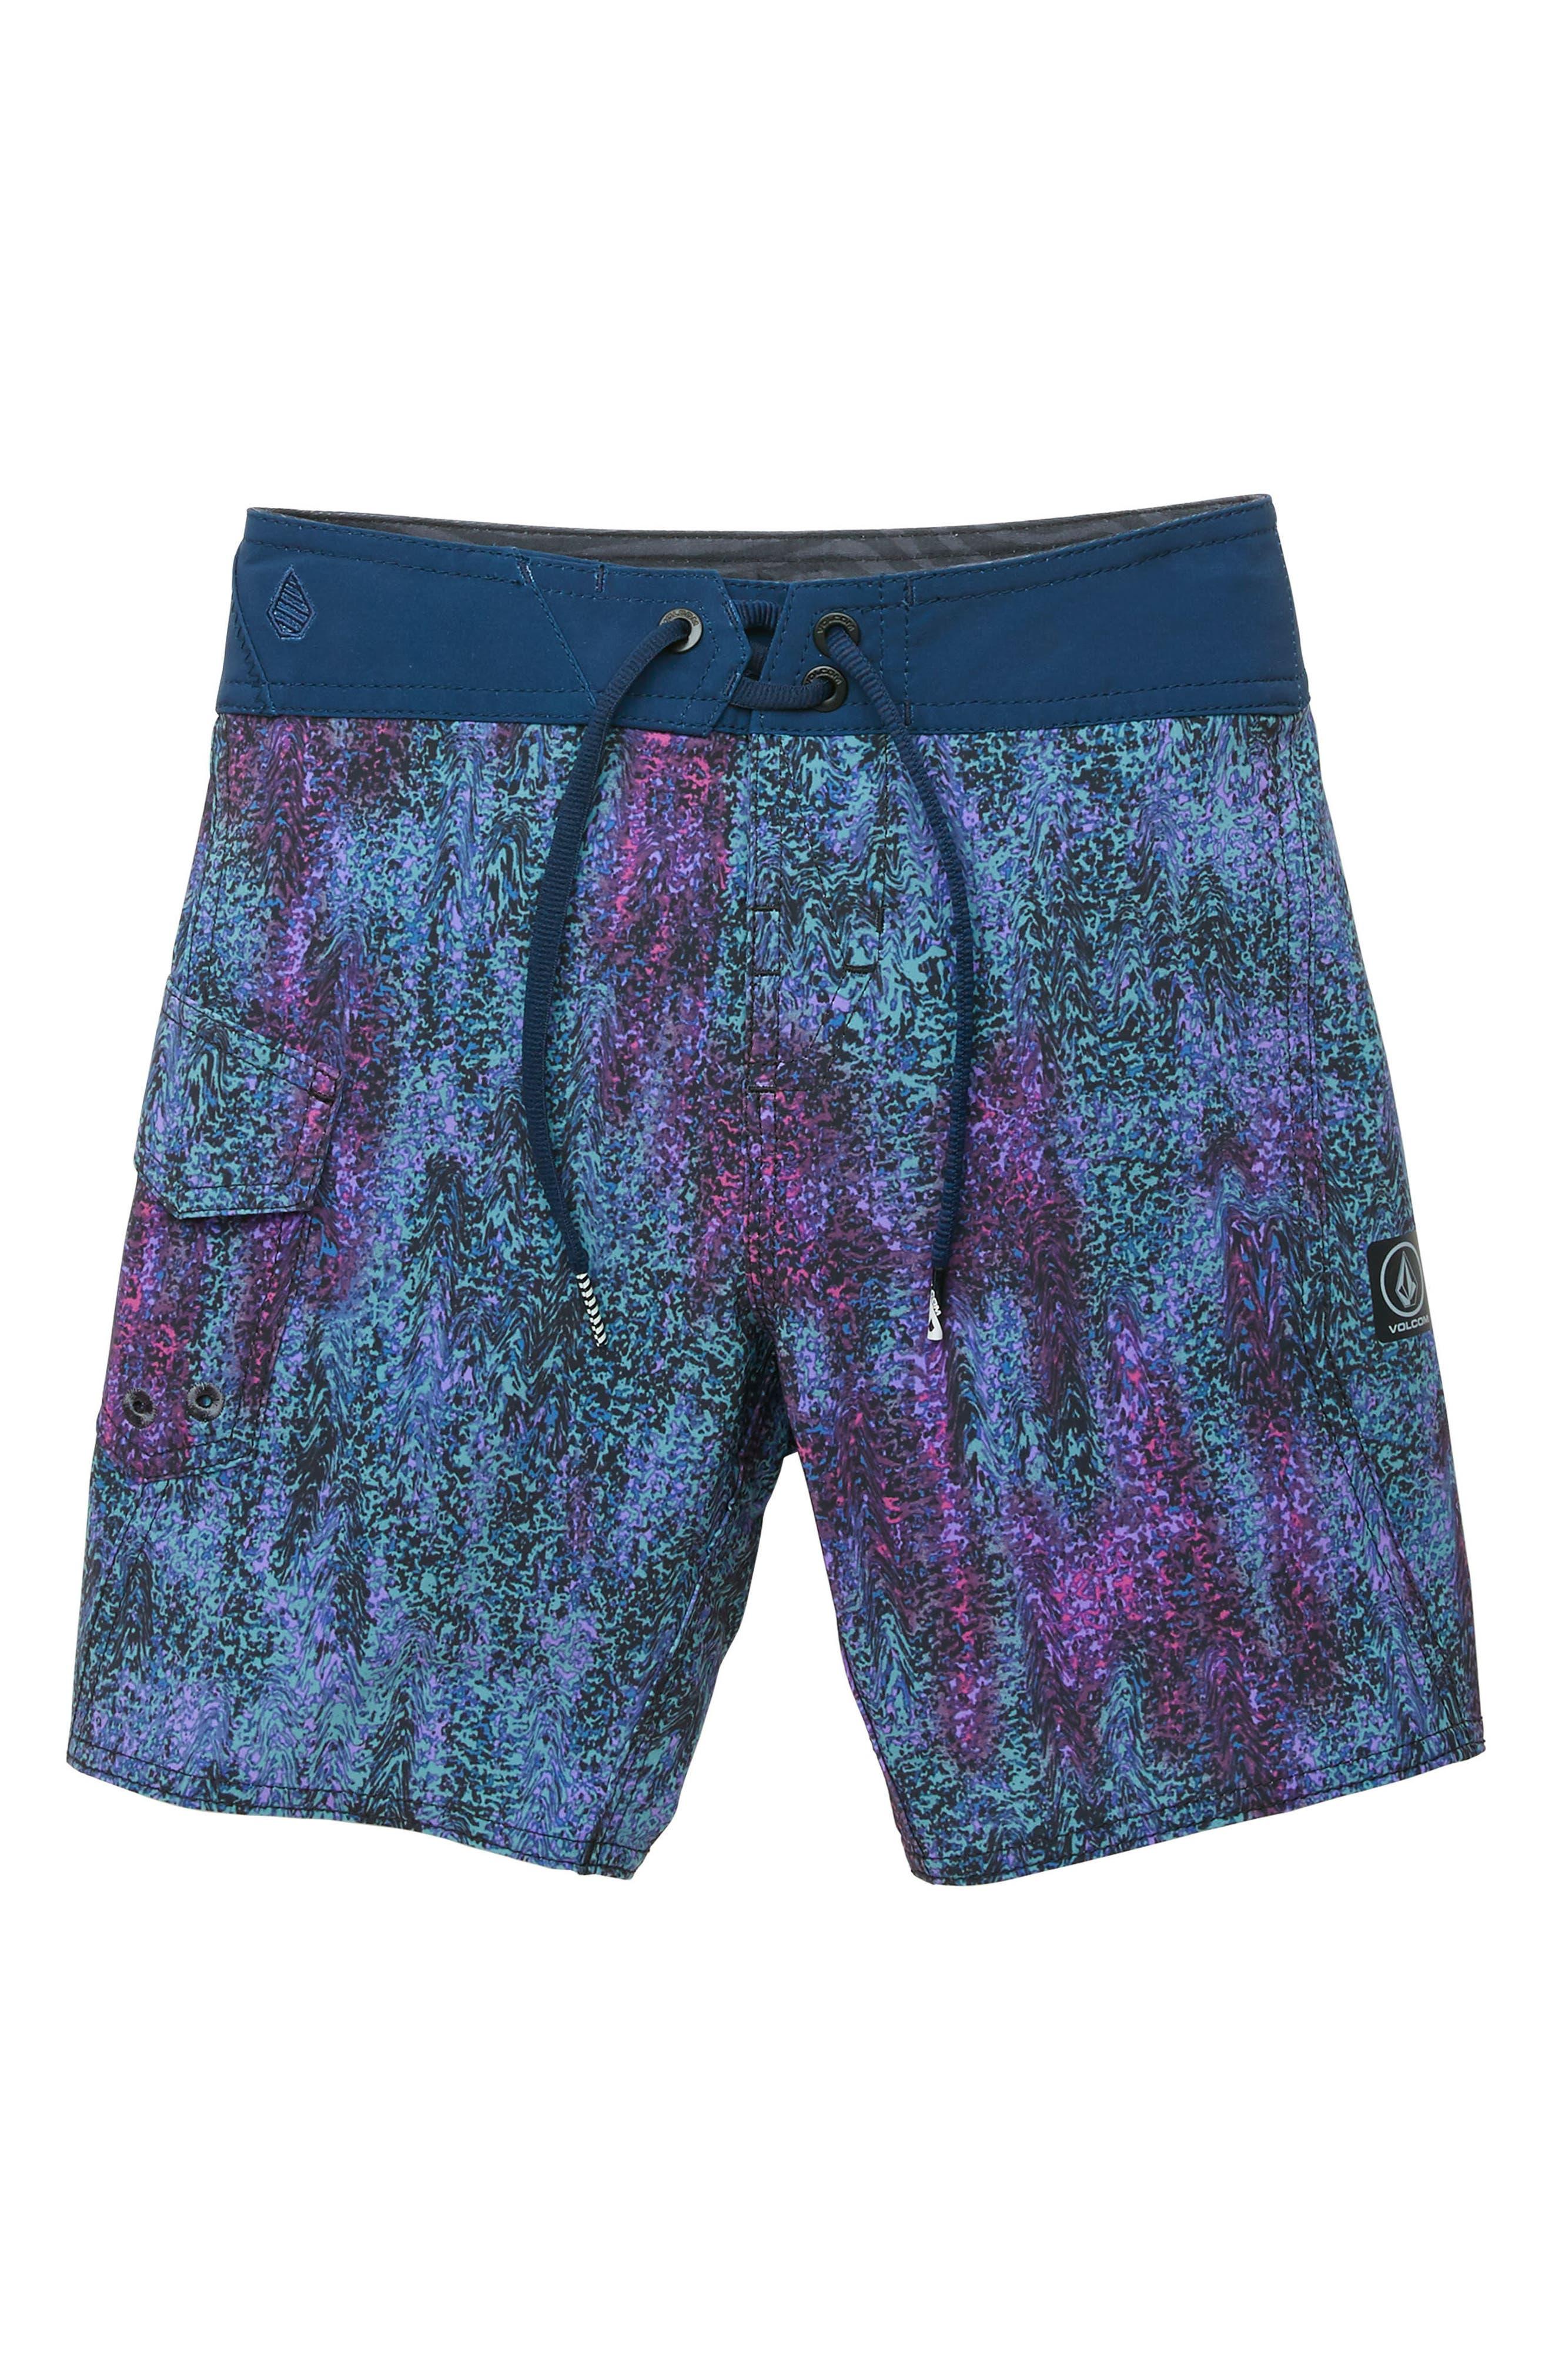 Plasm Mod Board Shorts,                             Main thumbnail 1, color,                             405